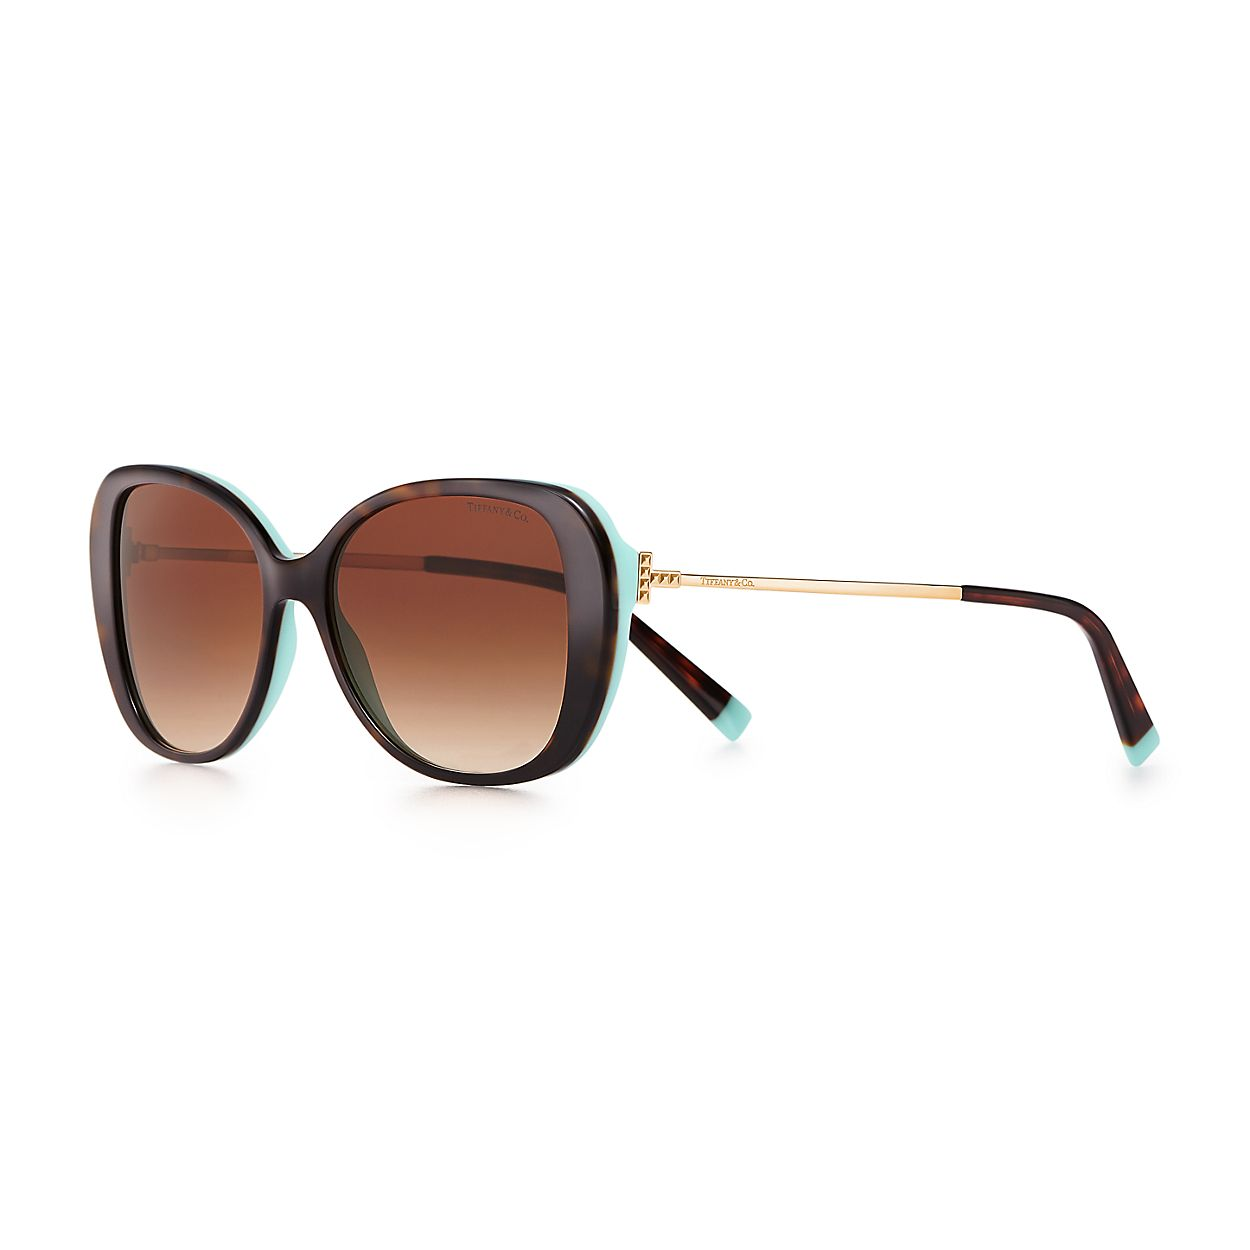 f3da82f7121 Tiffany T butterfly sunglasses in tortoise and Tiffany Blue® acetate ...